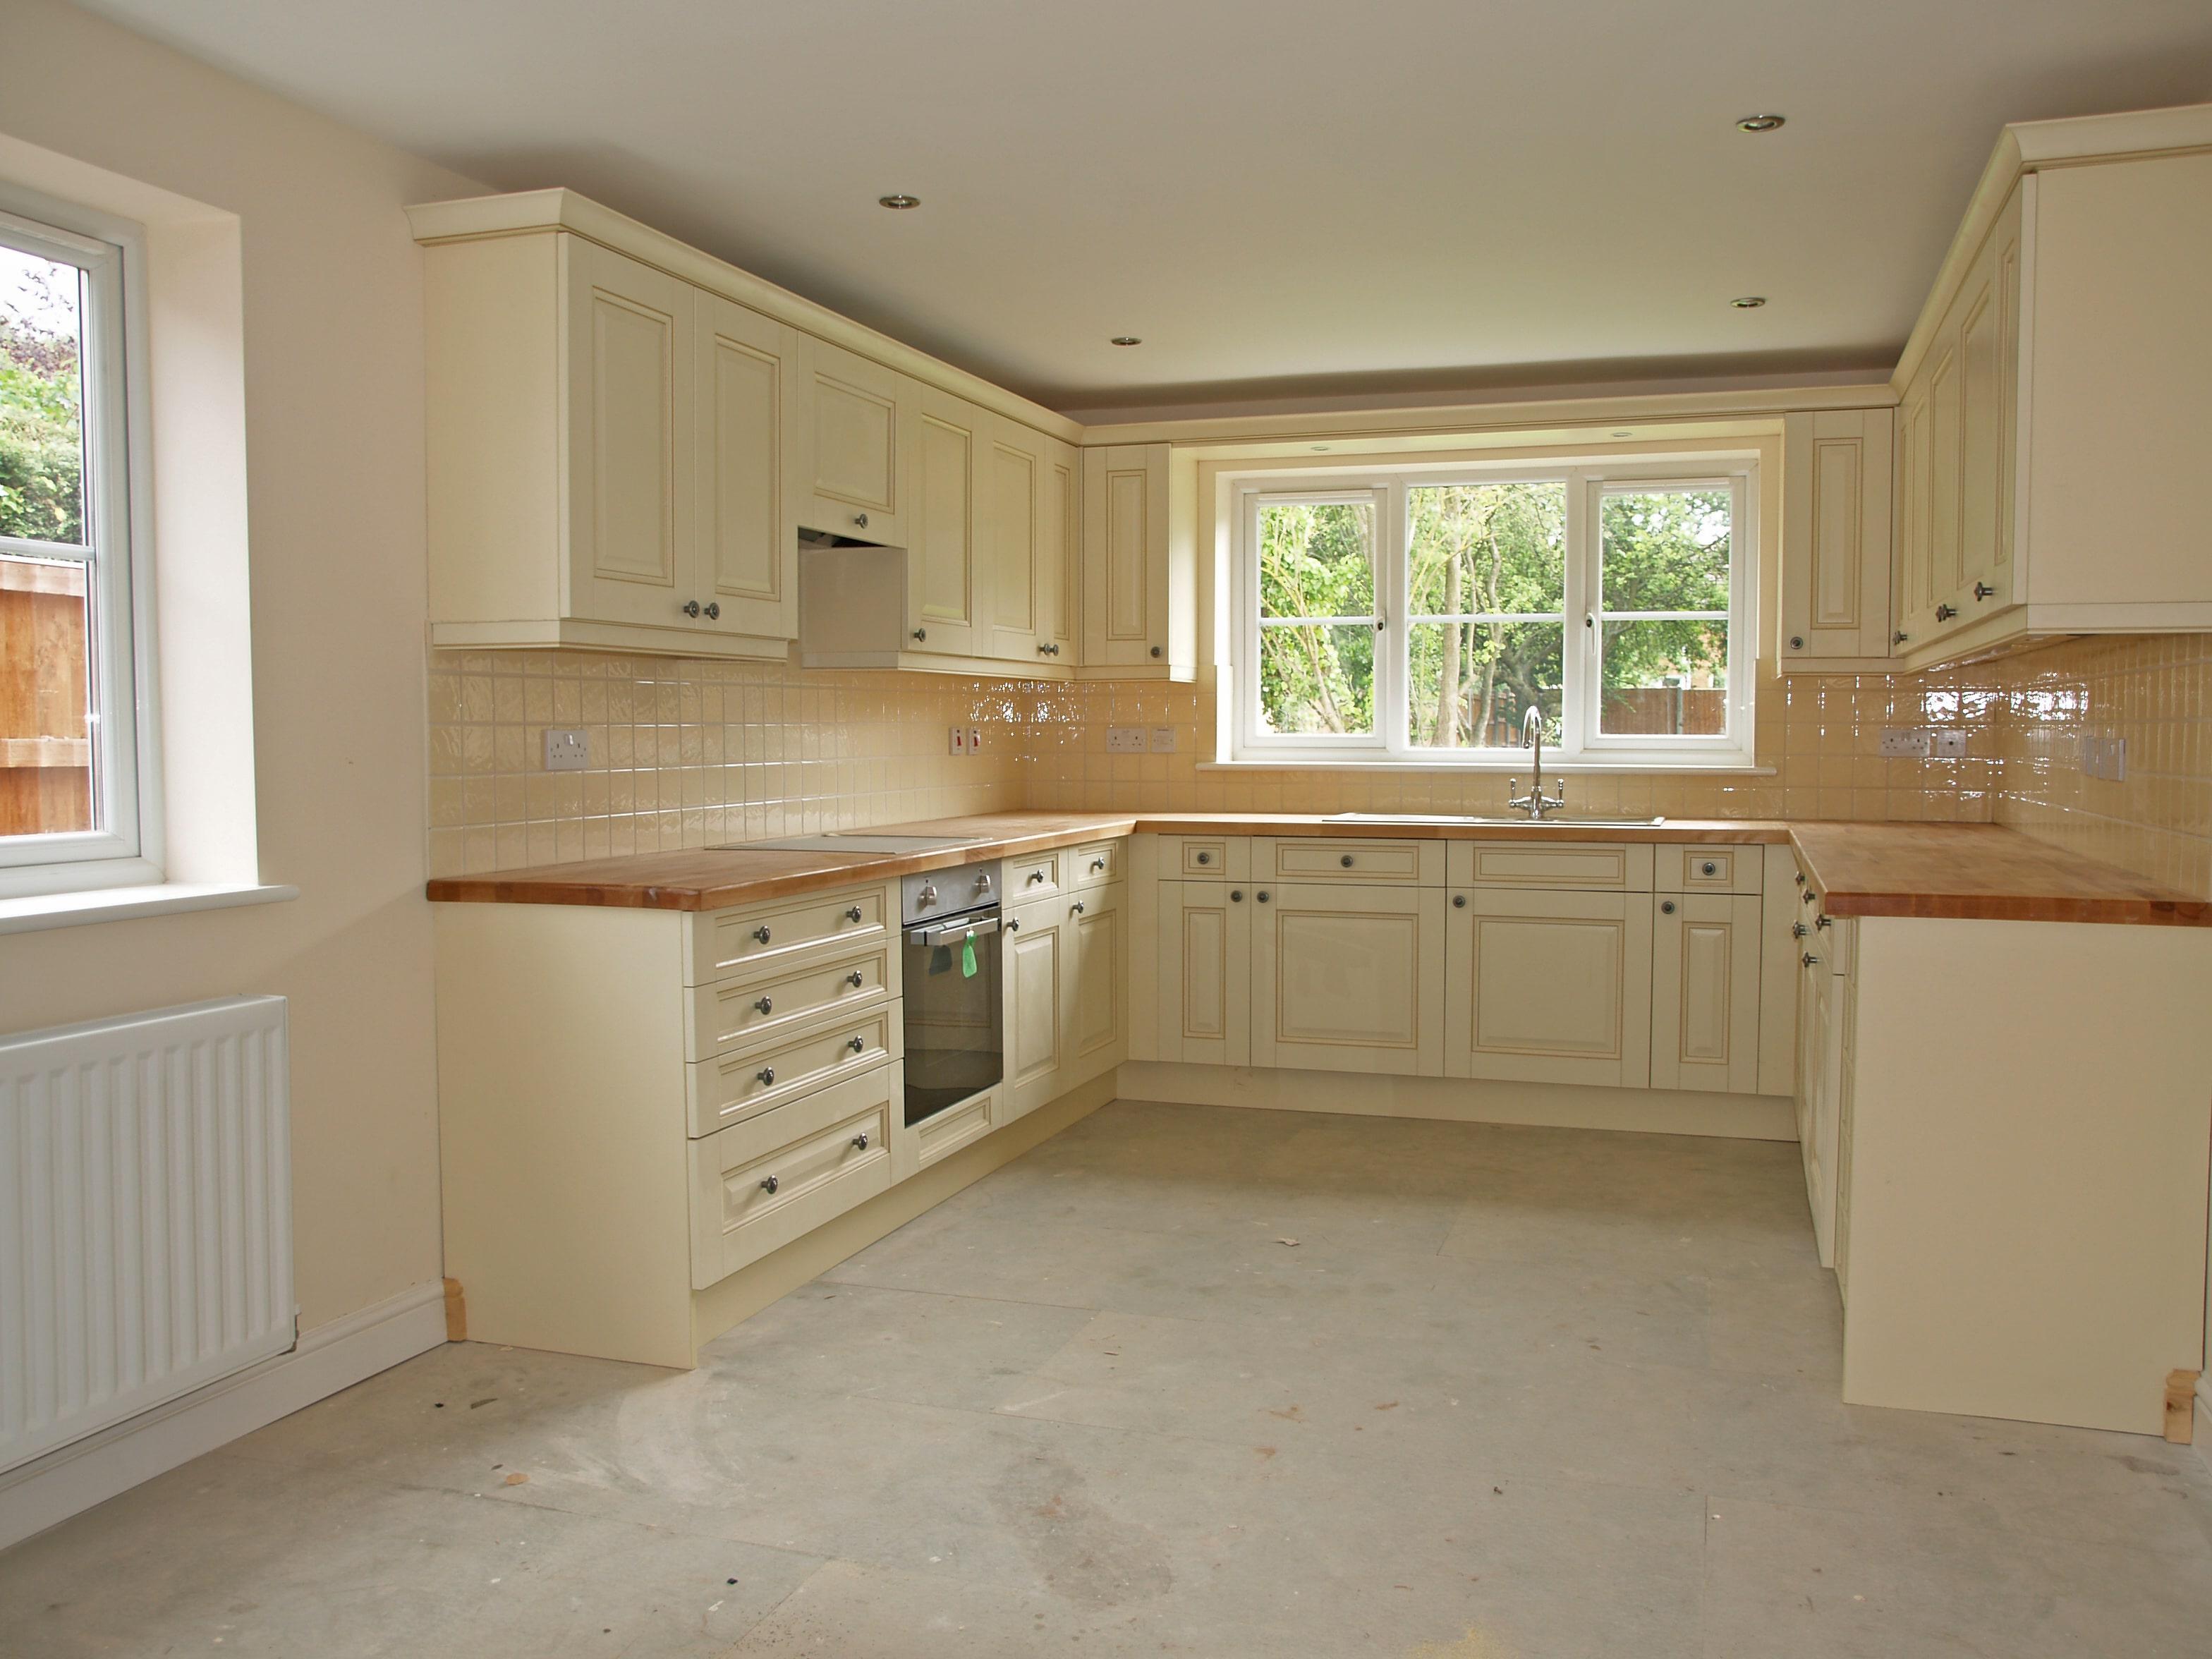 44A Bellars Lane, kitchen